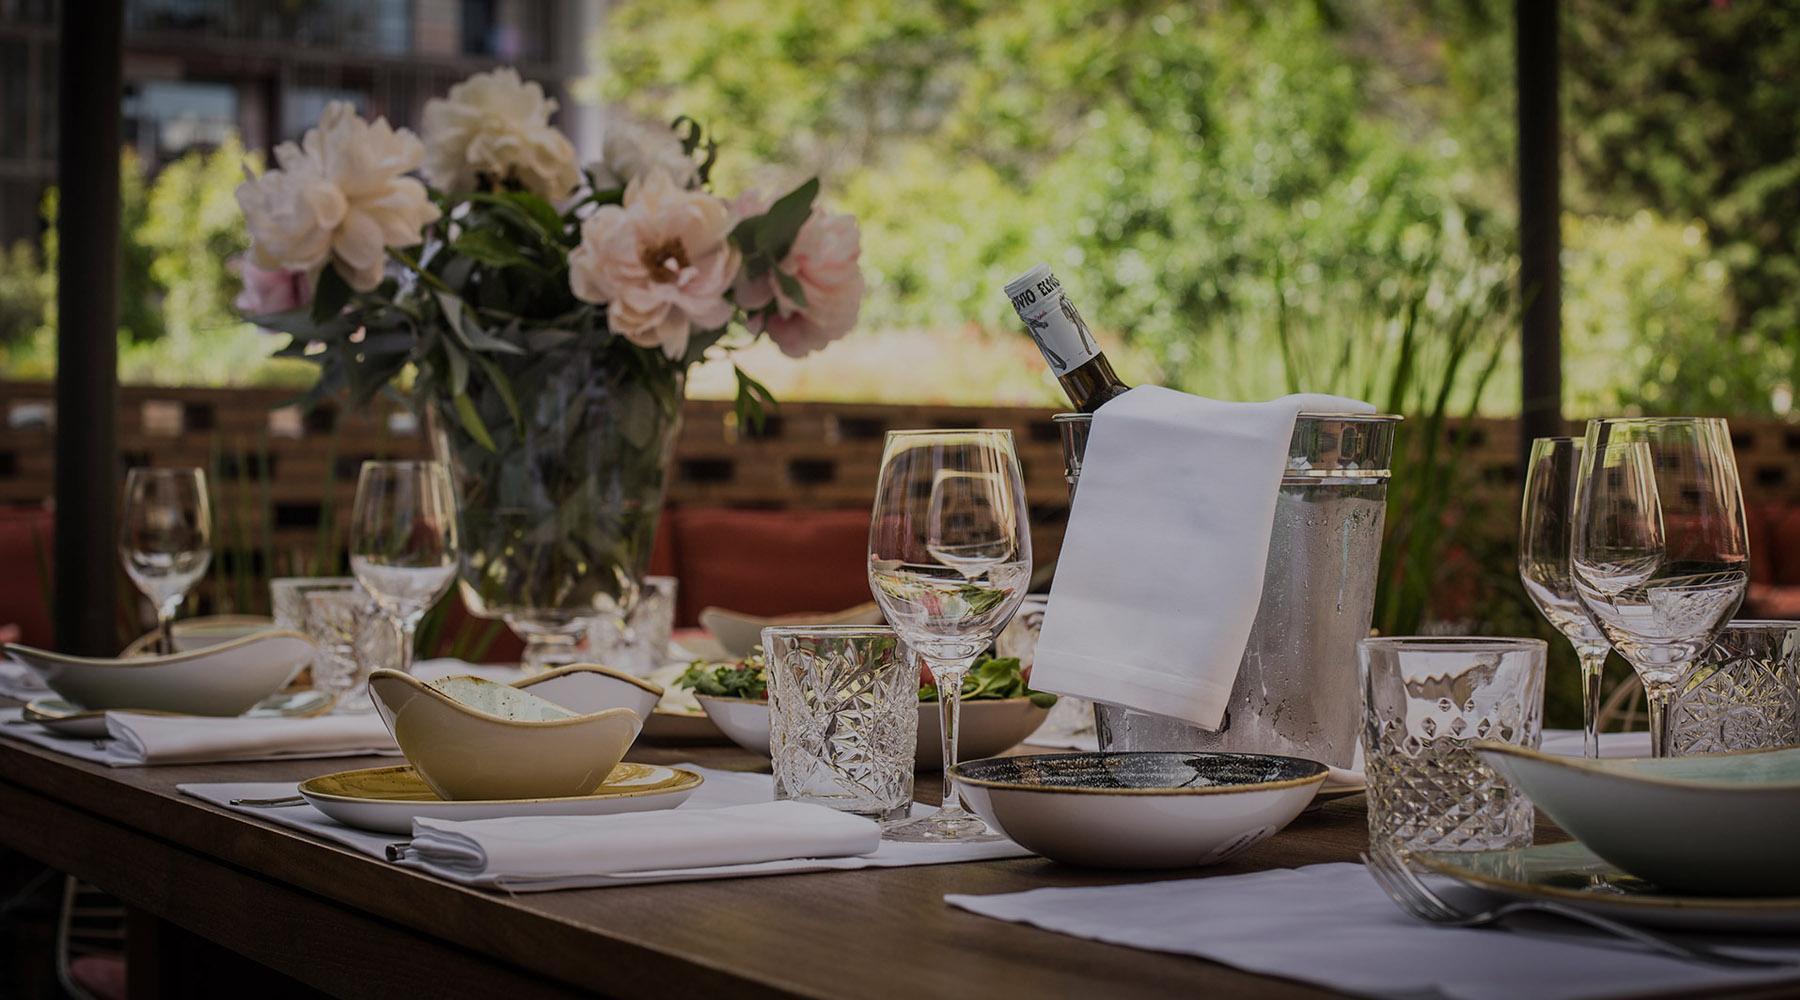 restaurante solomillo patio terraza